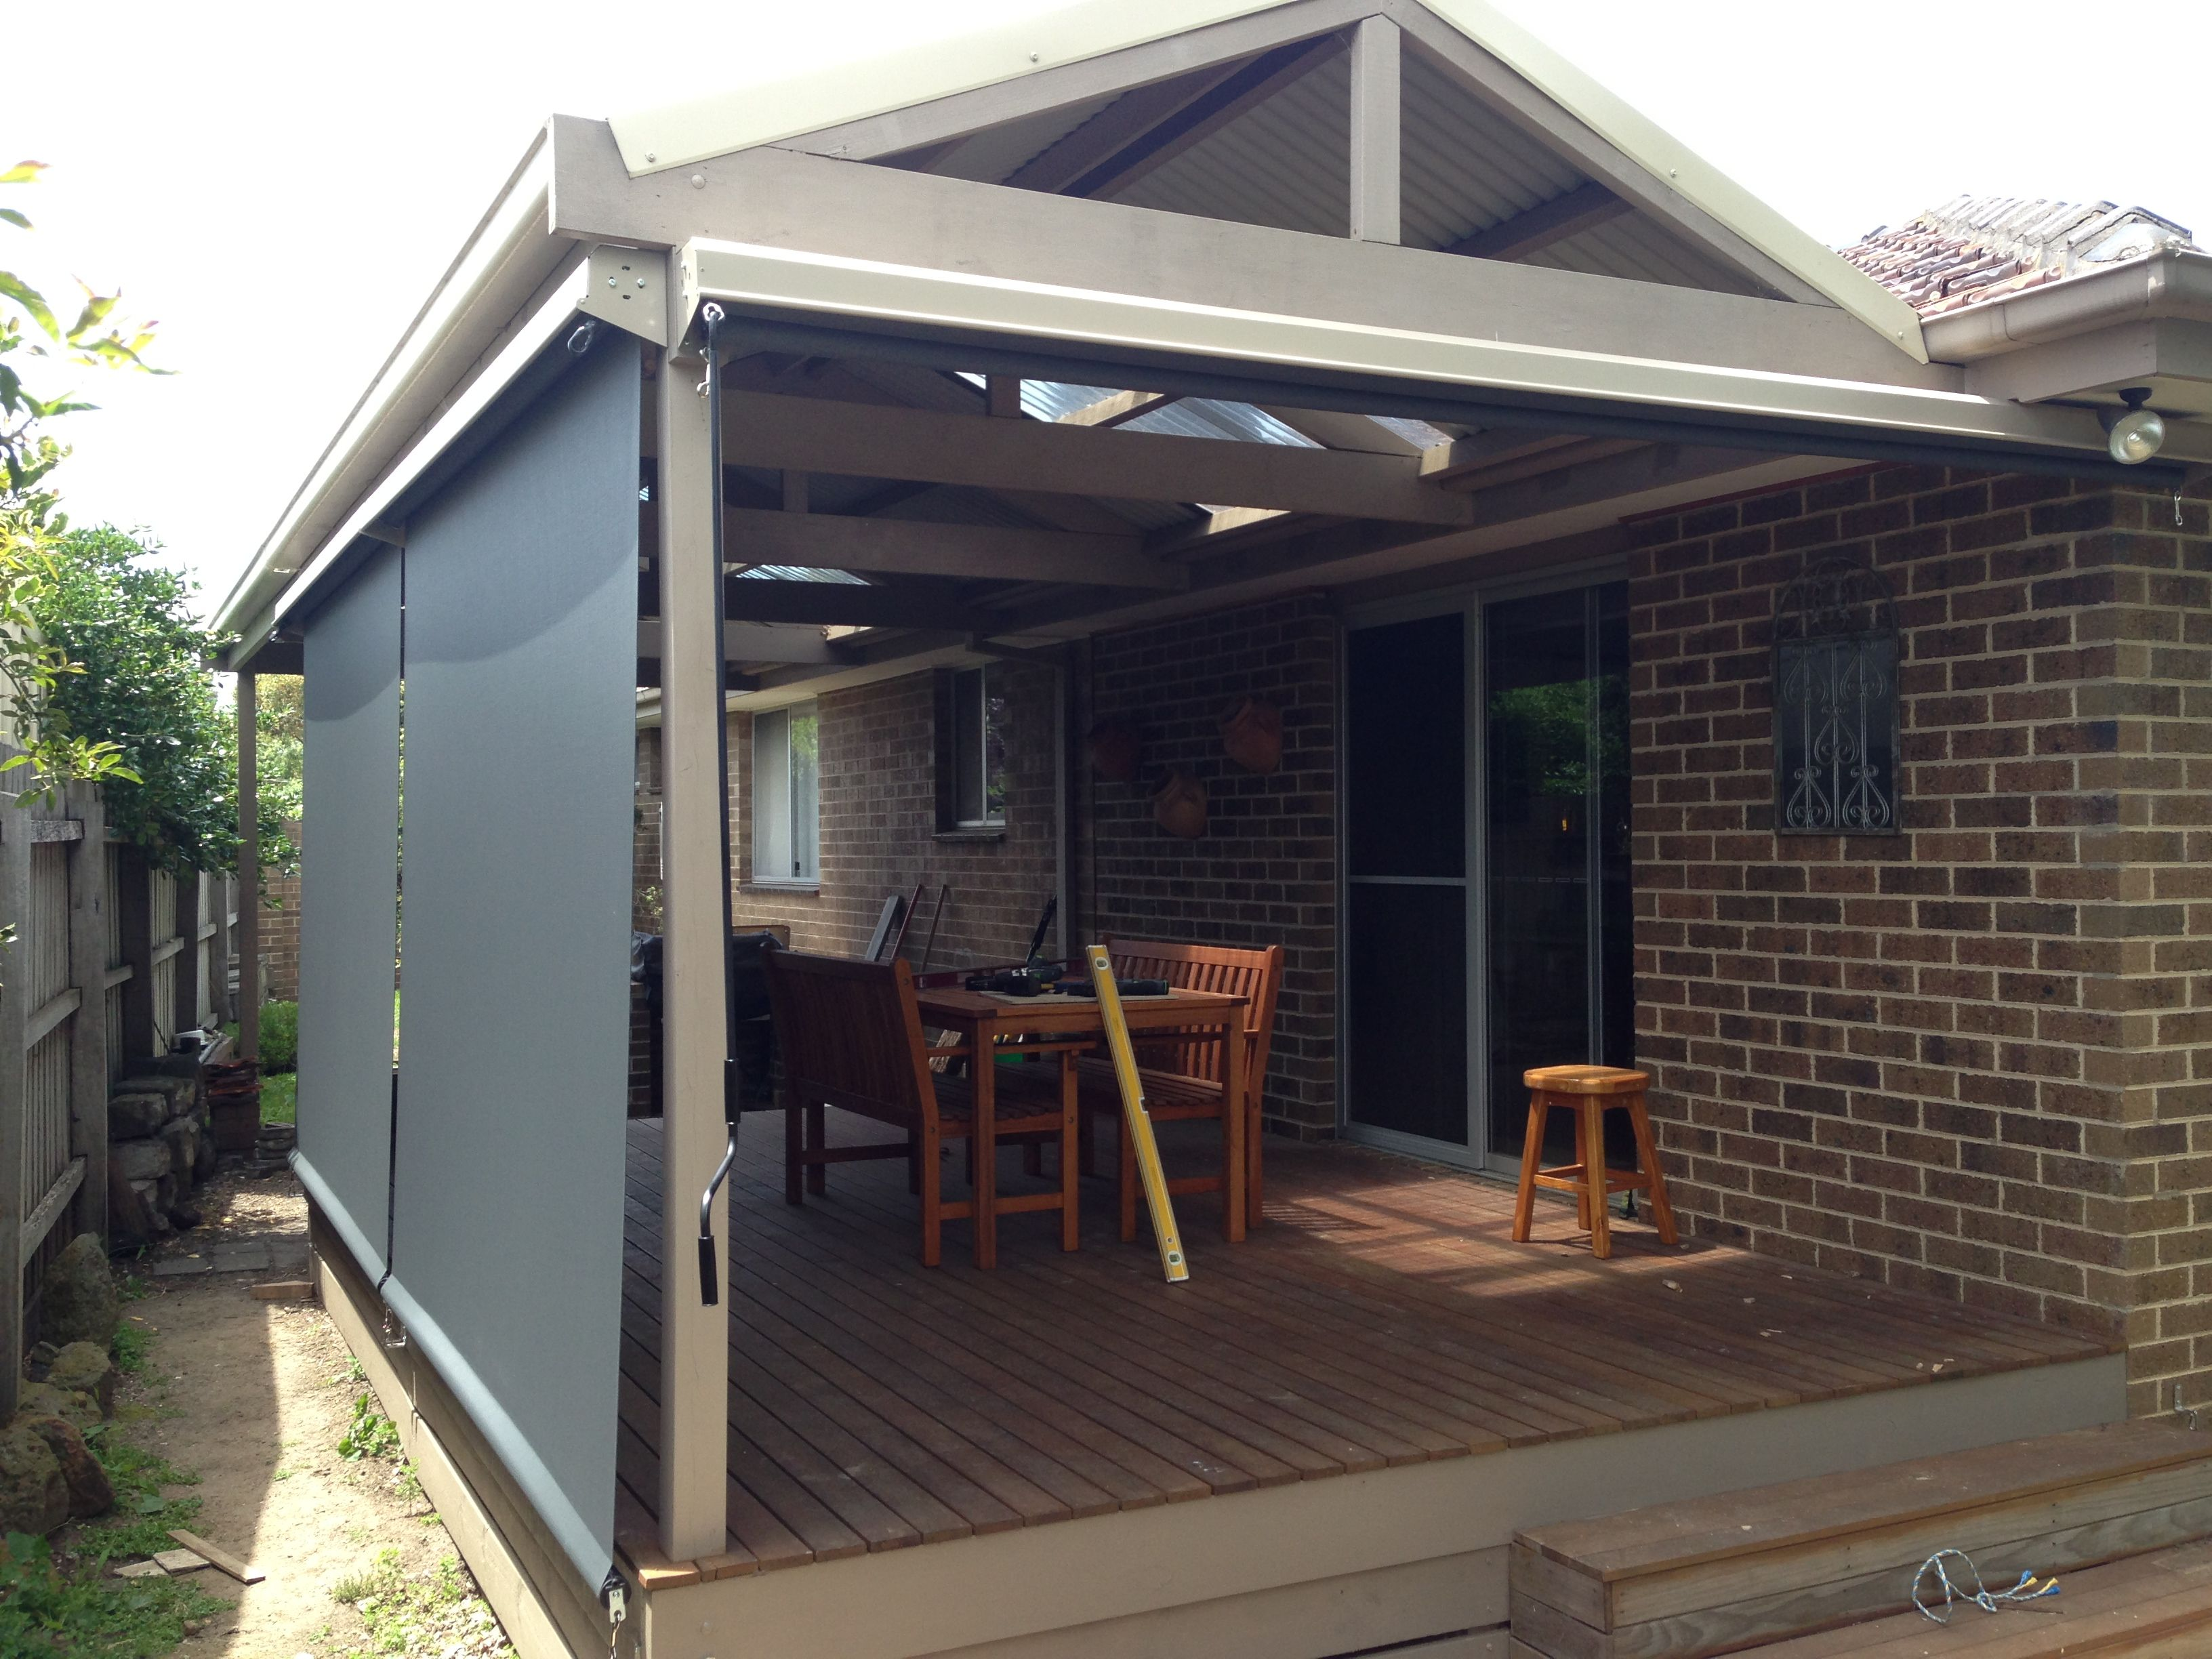 At Top Spot Blinds our outdoor blinds can enclose verandas